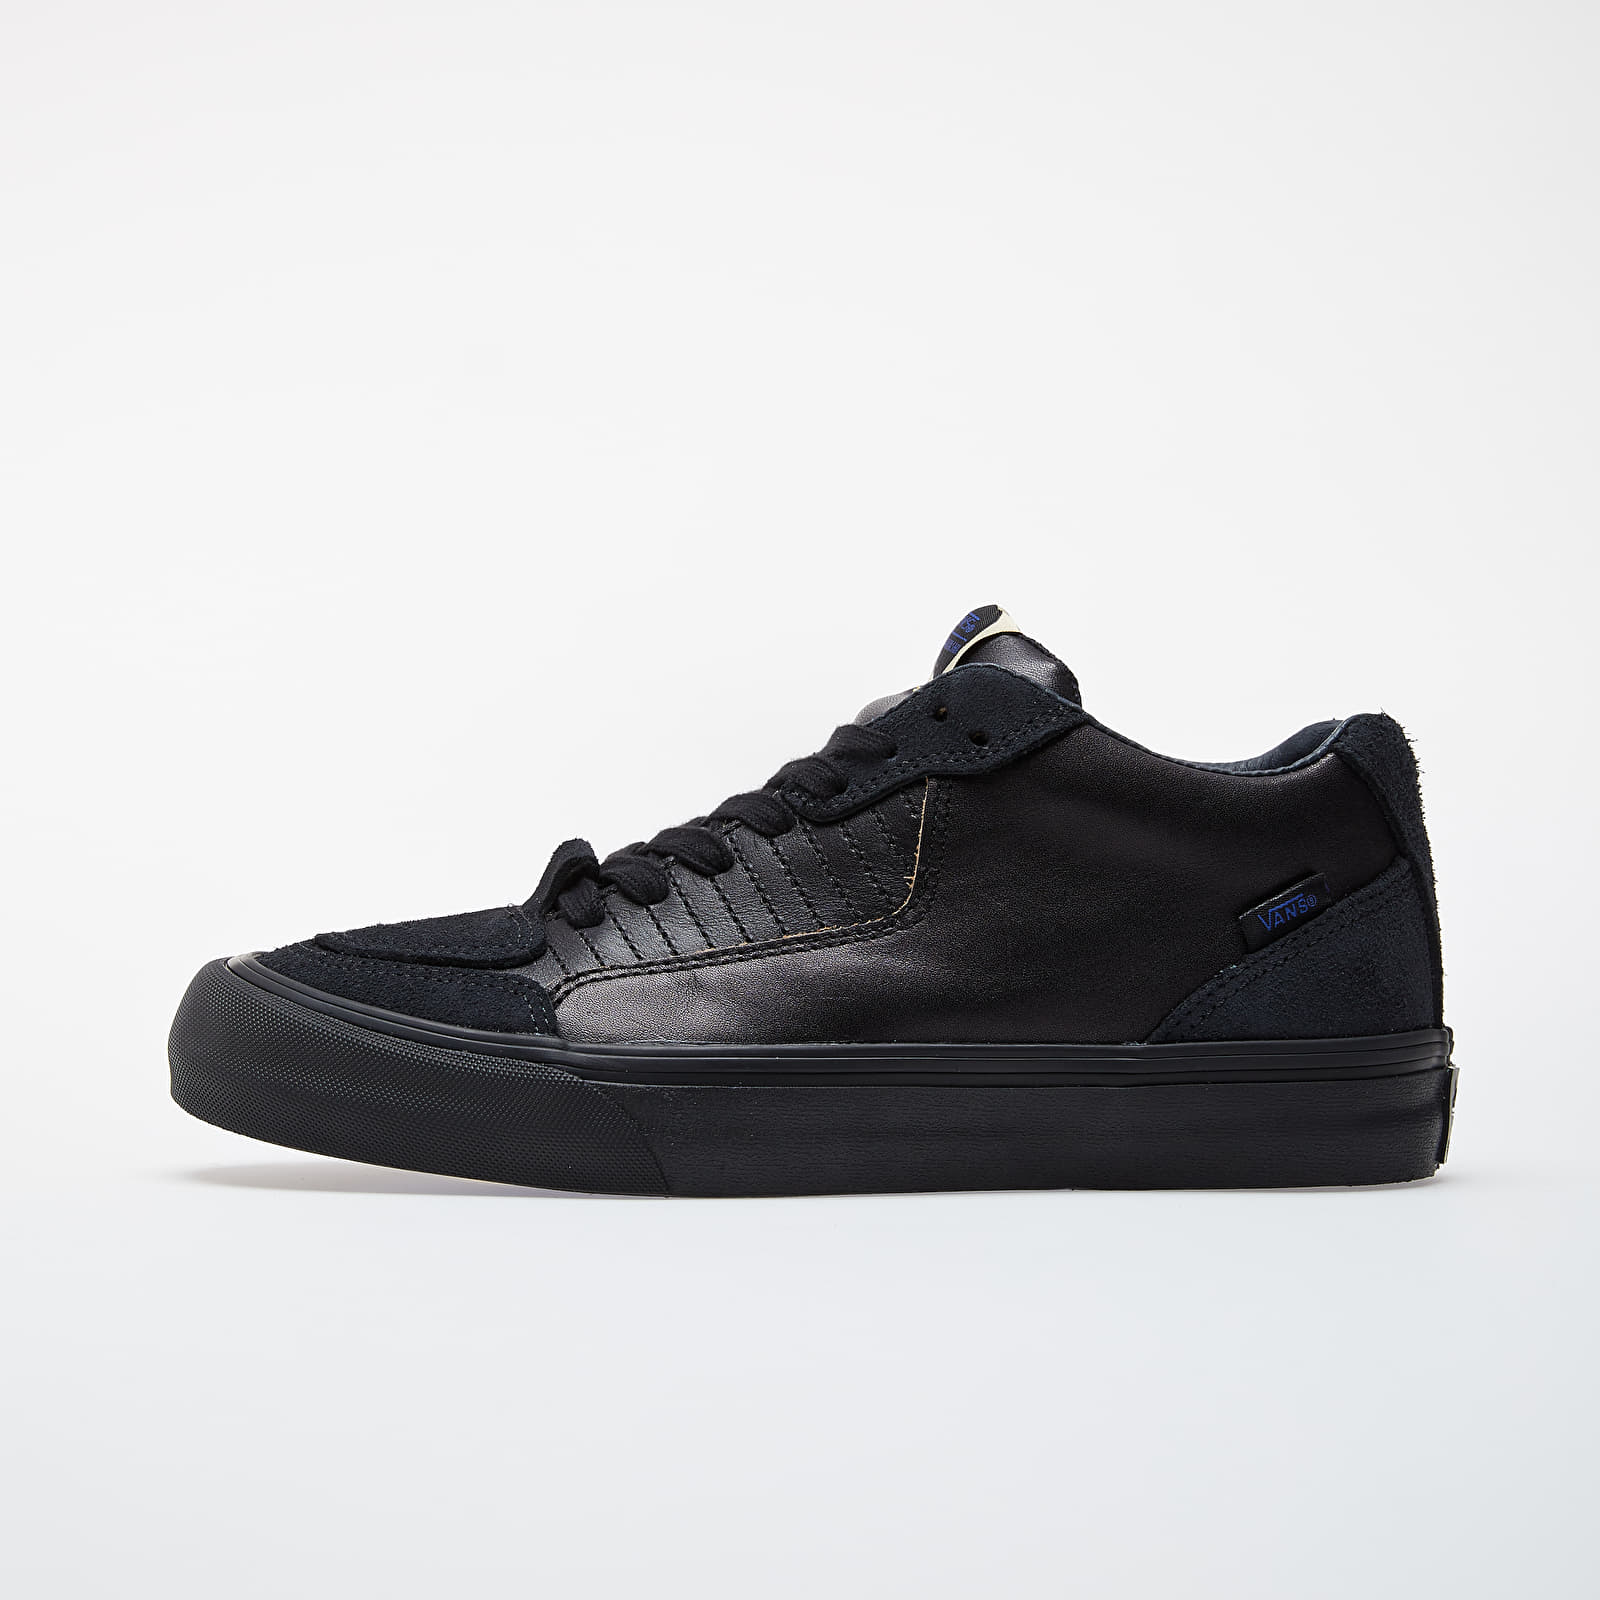 Vans x Taka Hayashi Style 98 LX (Leather/ Hairy Suede)